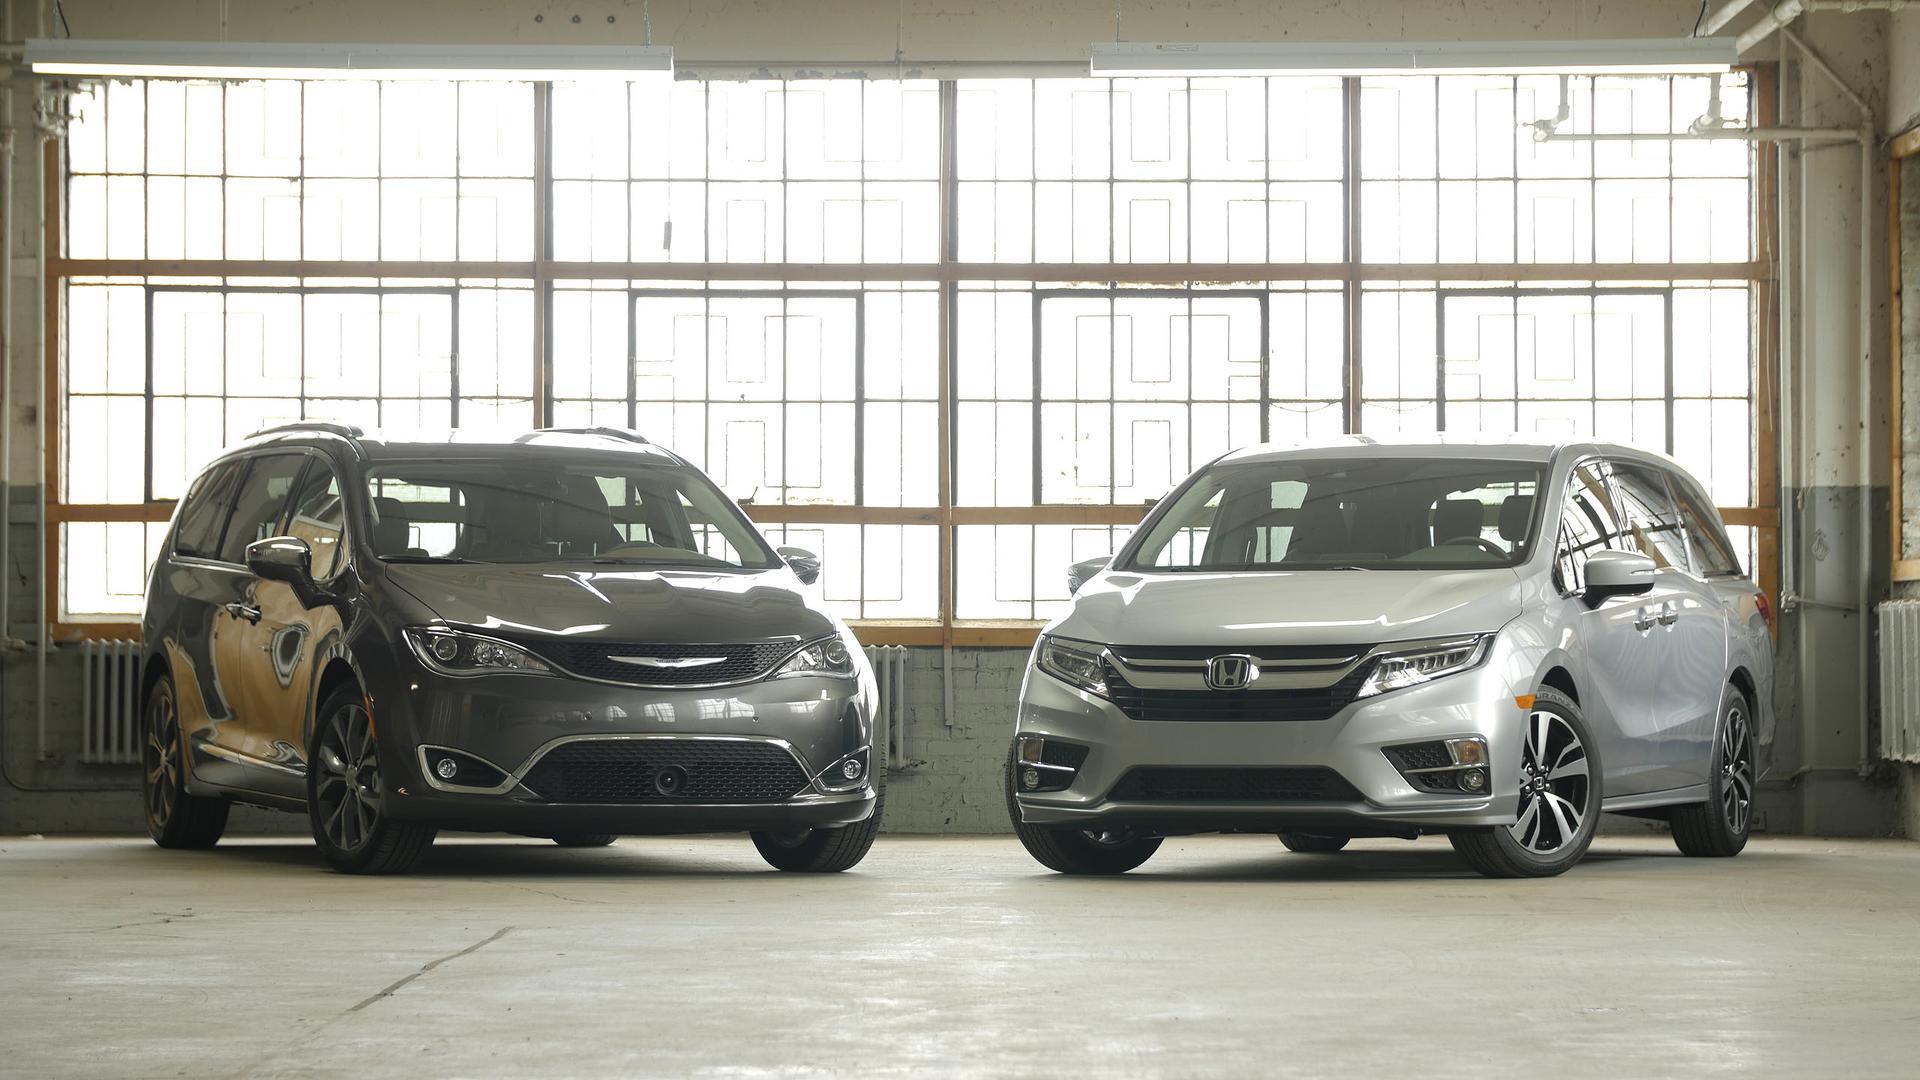 Chrysler Pacifica vs Honda Odyssey Impossibly Close